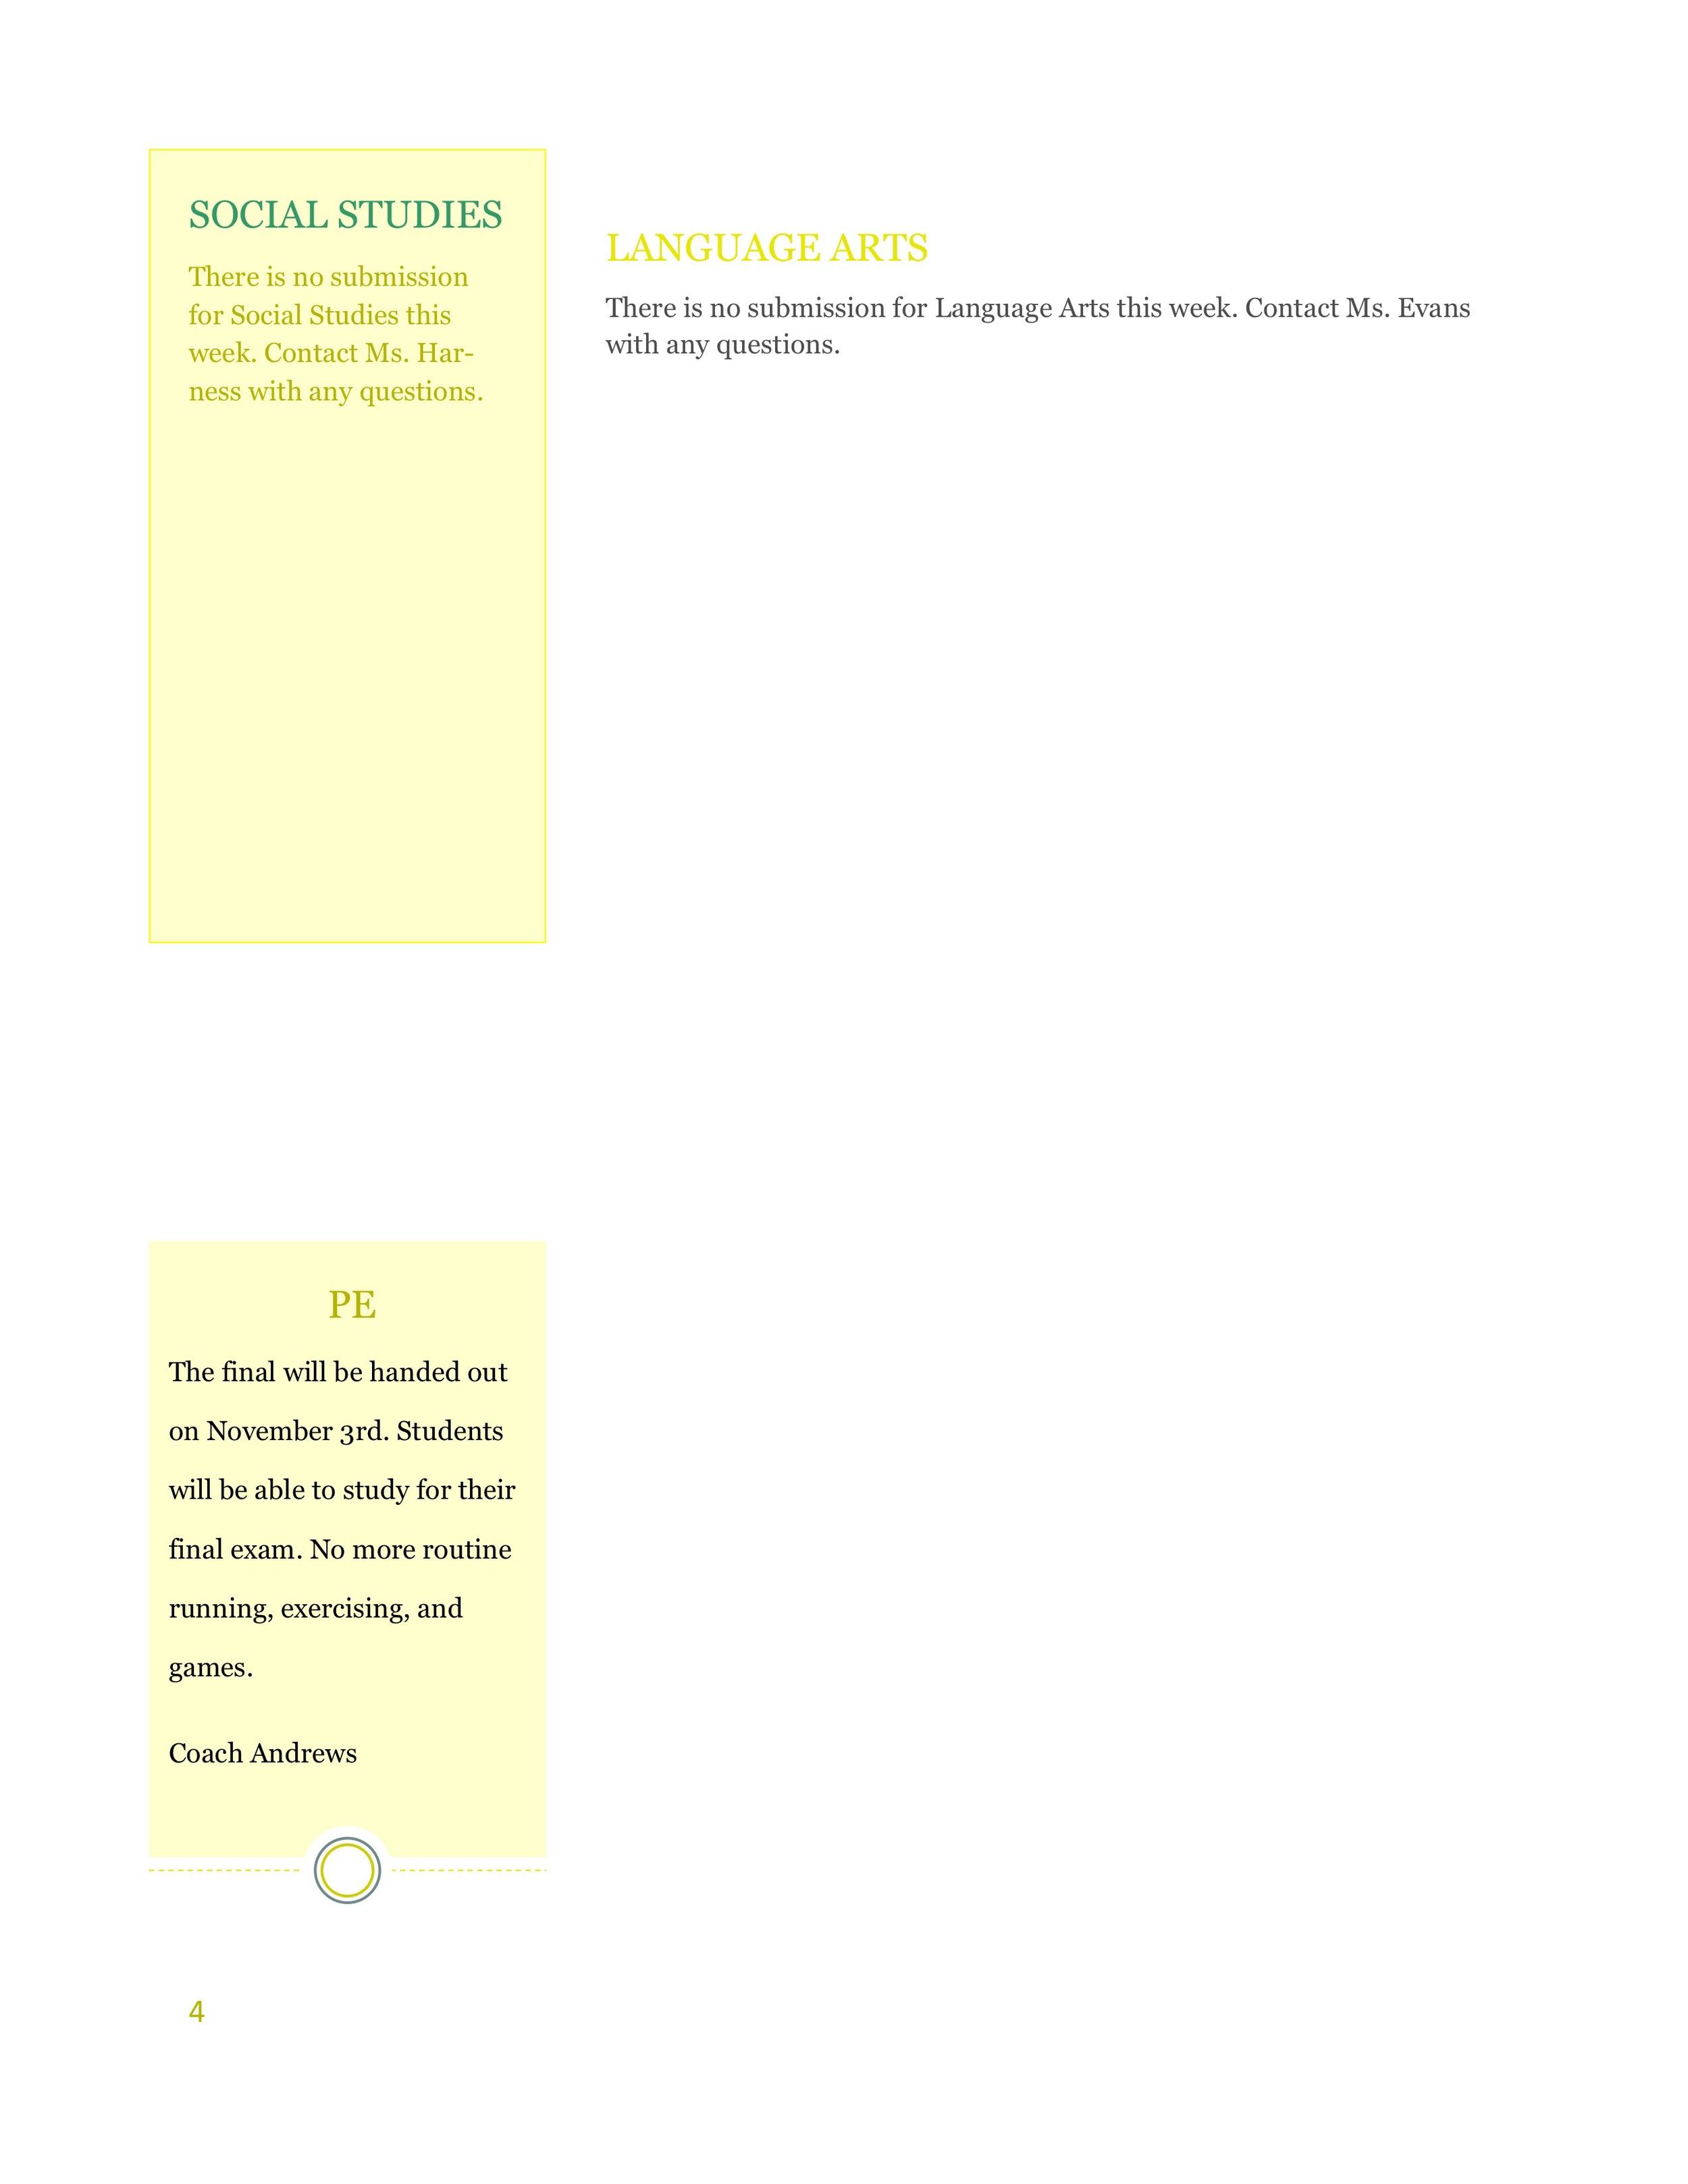 Newsletter Image6th grade October 27-31 4.jpeg